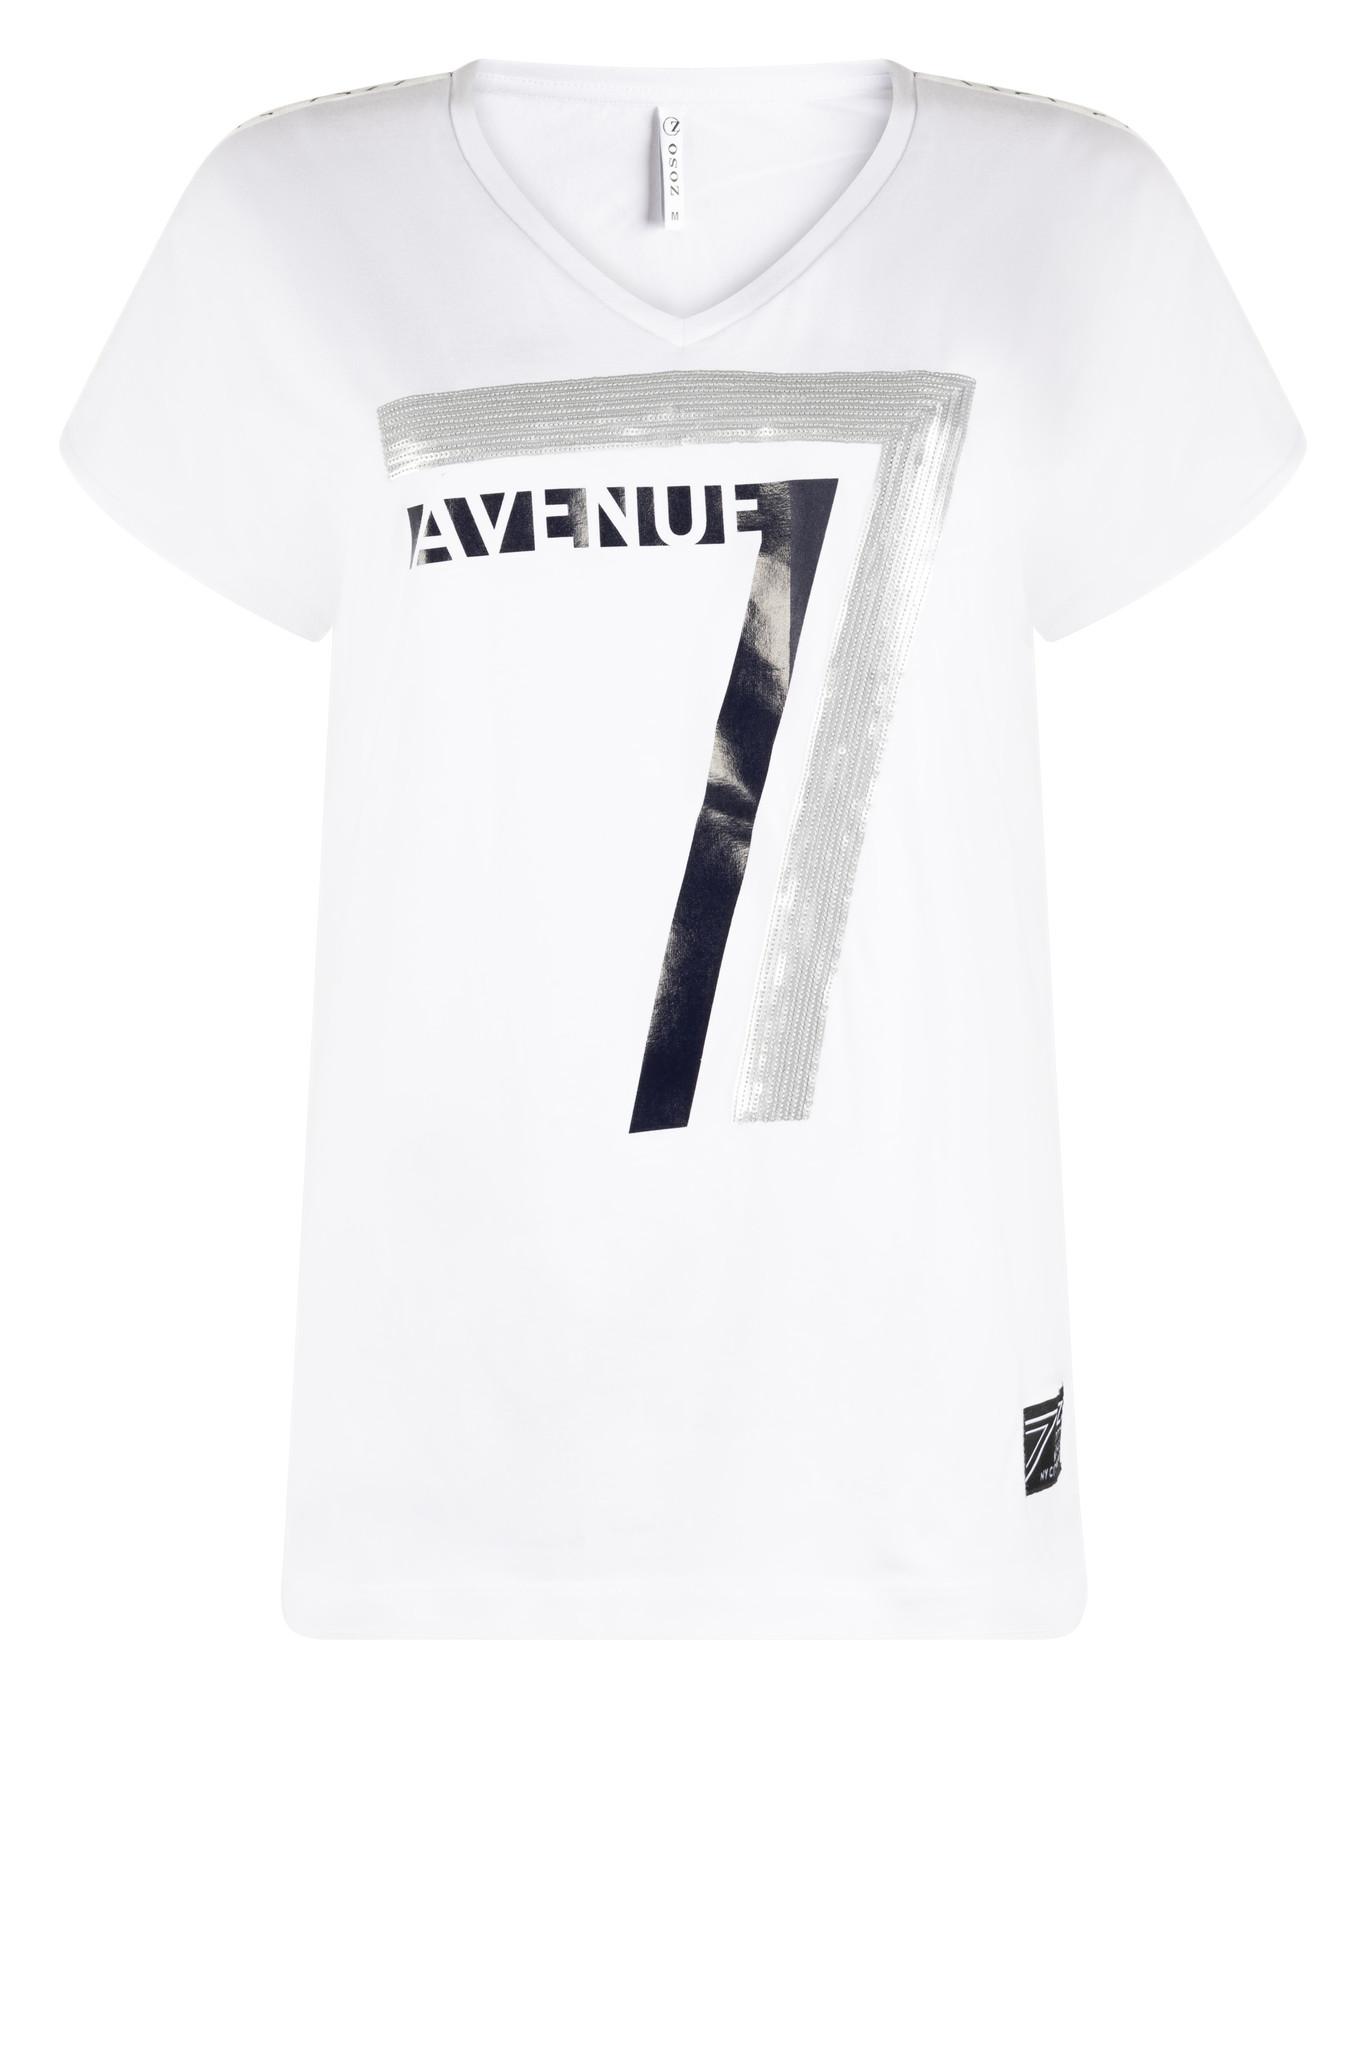 Zoso Zoso Britt T-shirtwith print & sequins white/navy